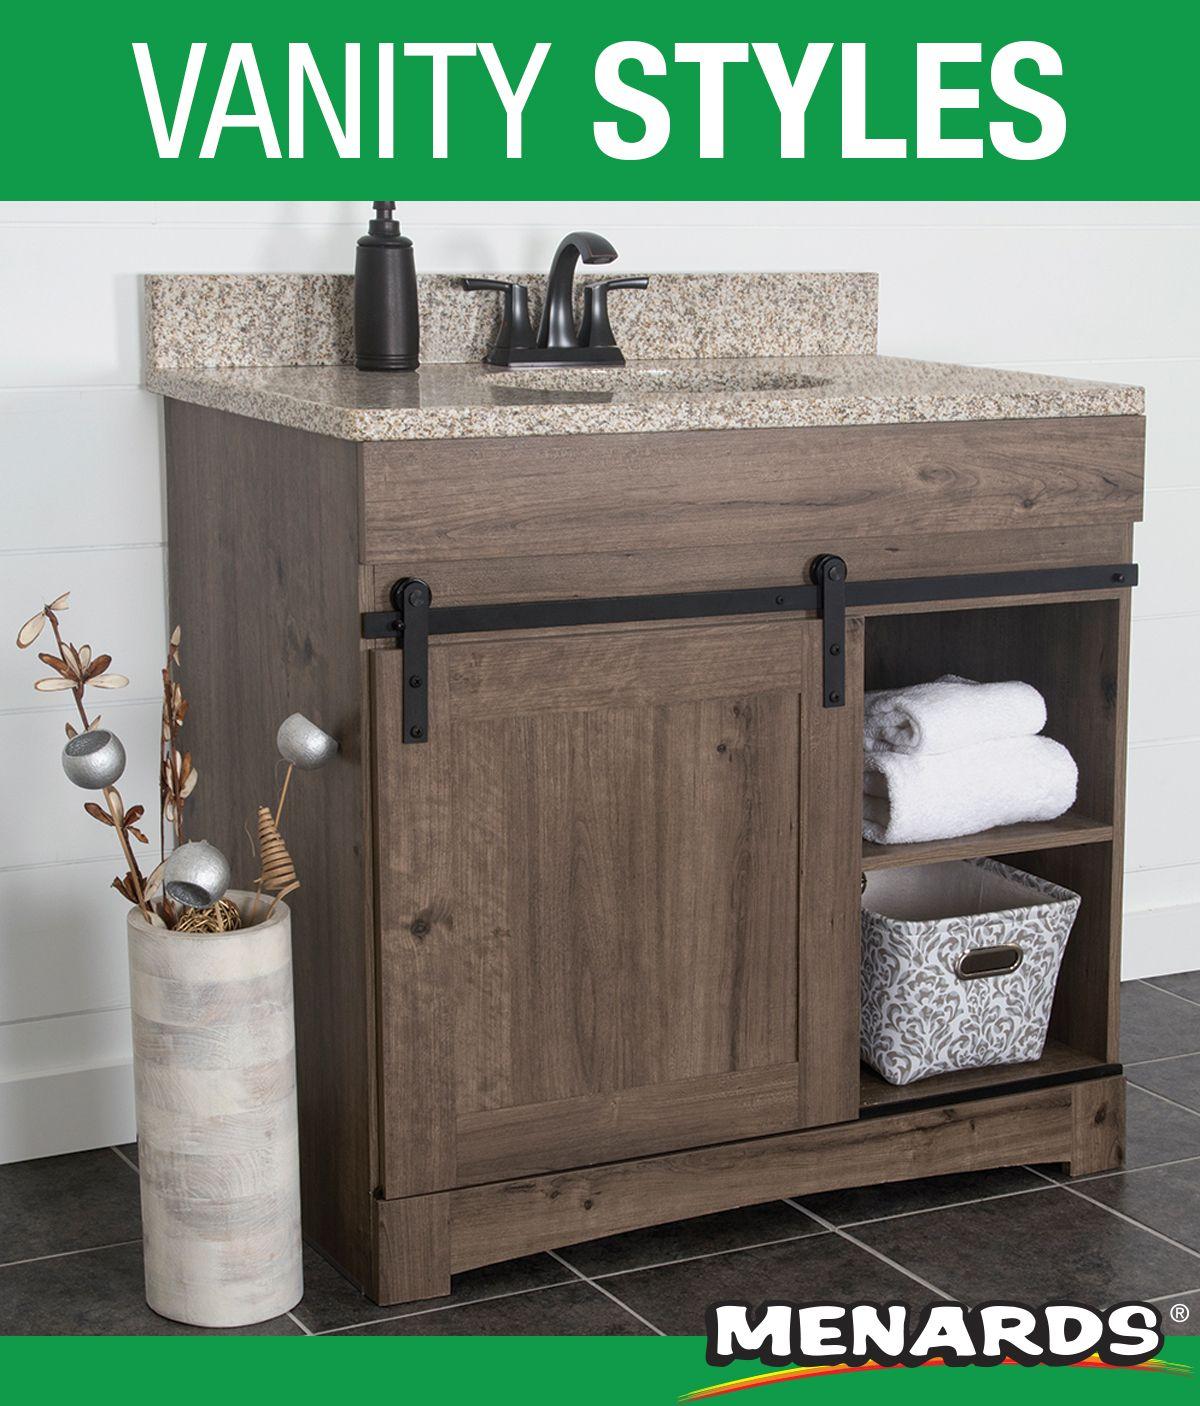 The Dakota Sliding Barn Door Vanity Makes For An Elegant And Functional Addition Luxury Bathroom Vanities Sliding Barn Door Bathroom Farmhouse Bathroom Vanity